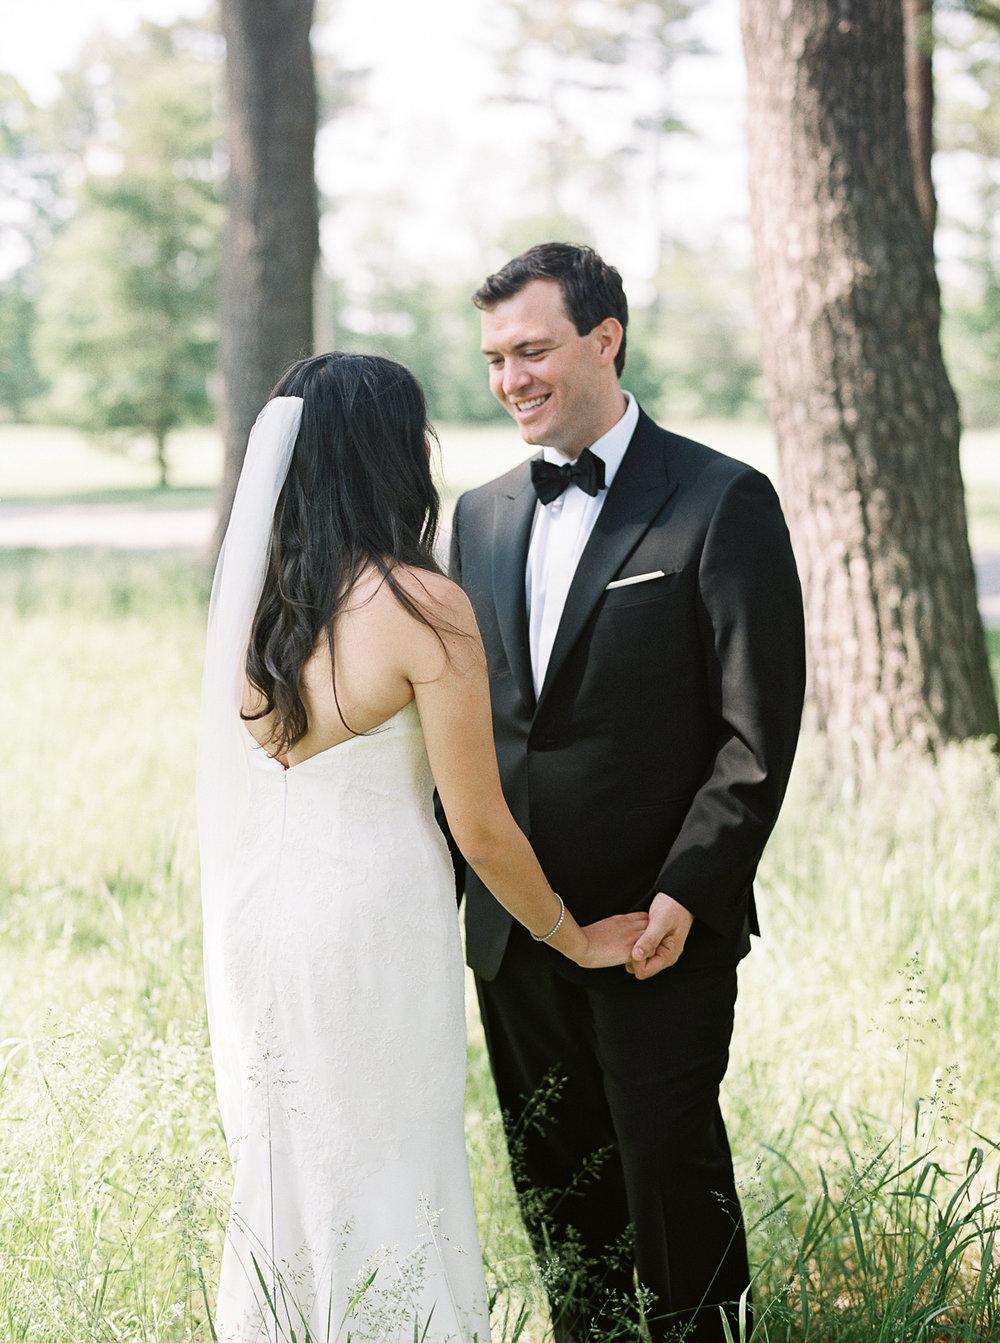 0724-Nadia-Chris-Married-When He Founf Her-Toronto Golf Club.jpg